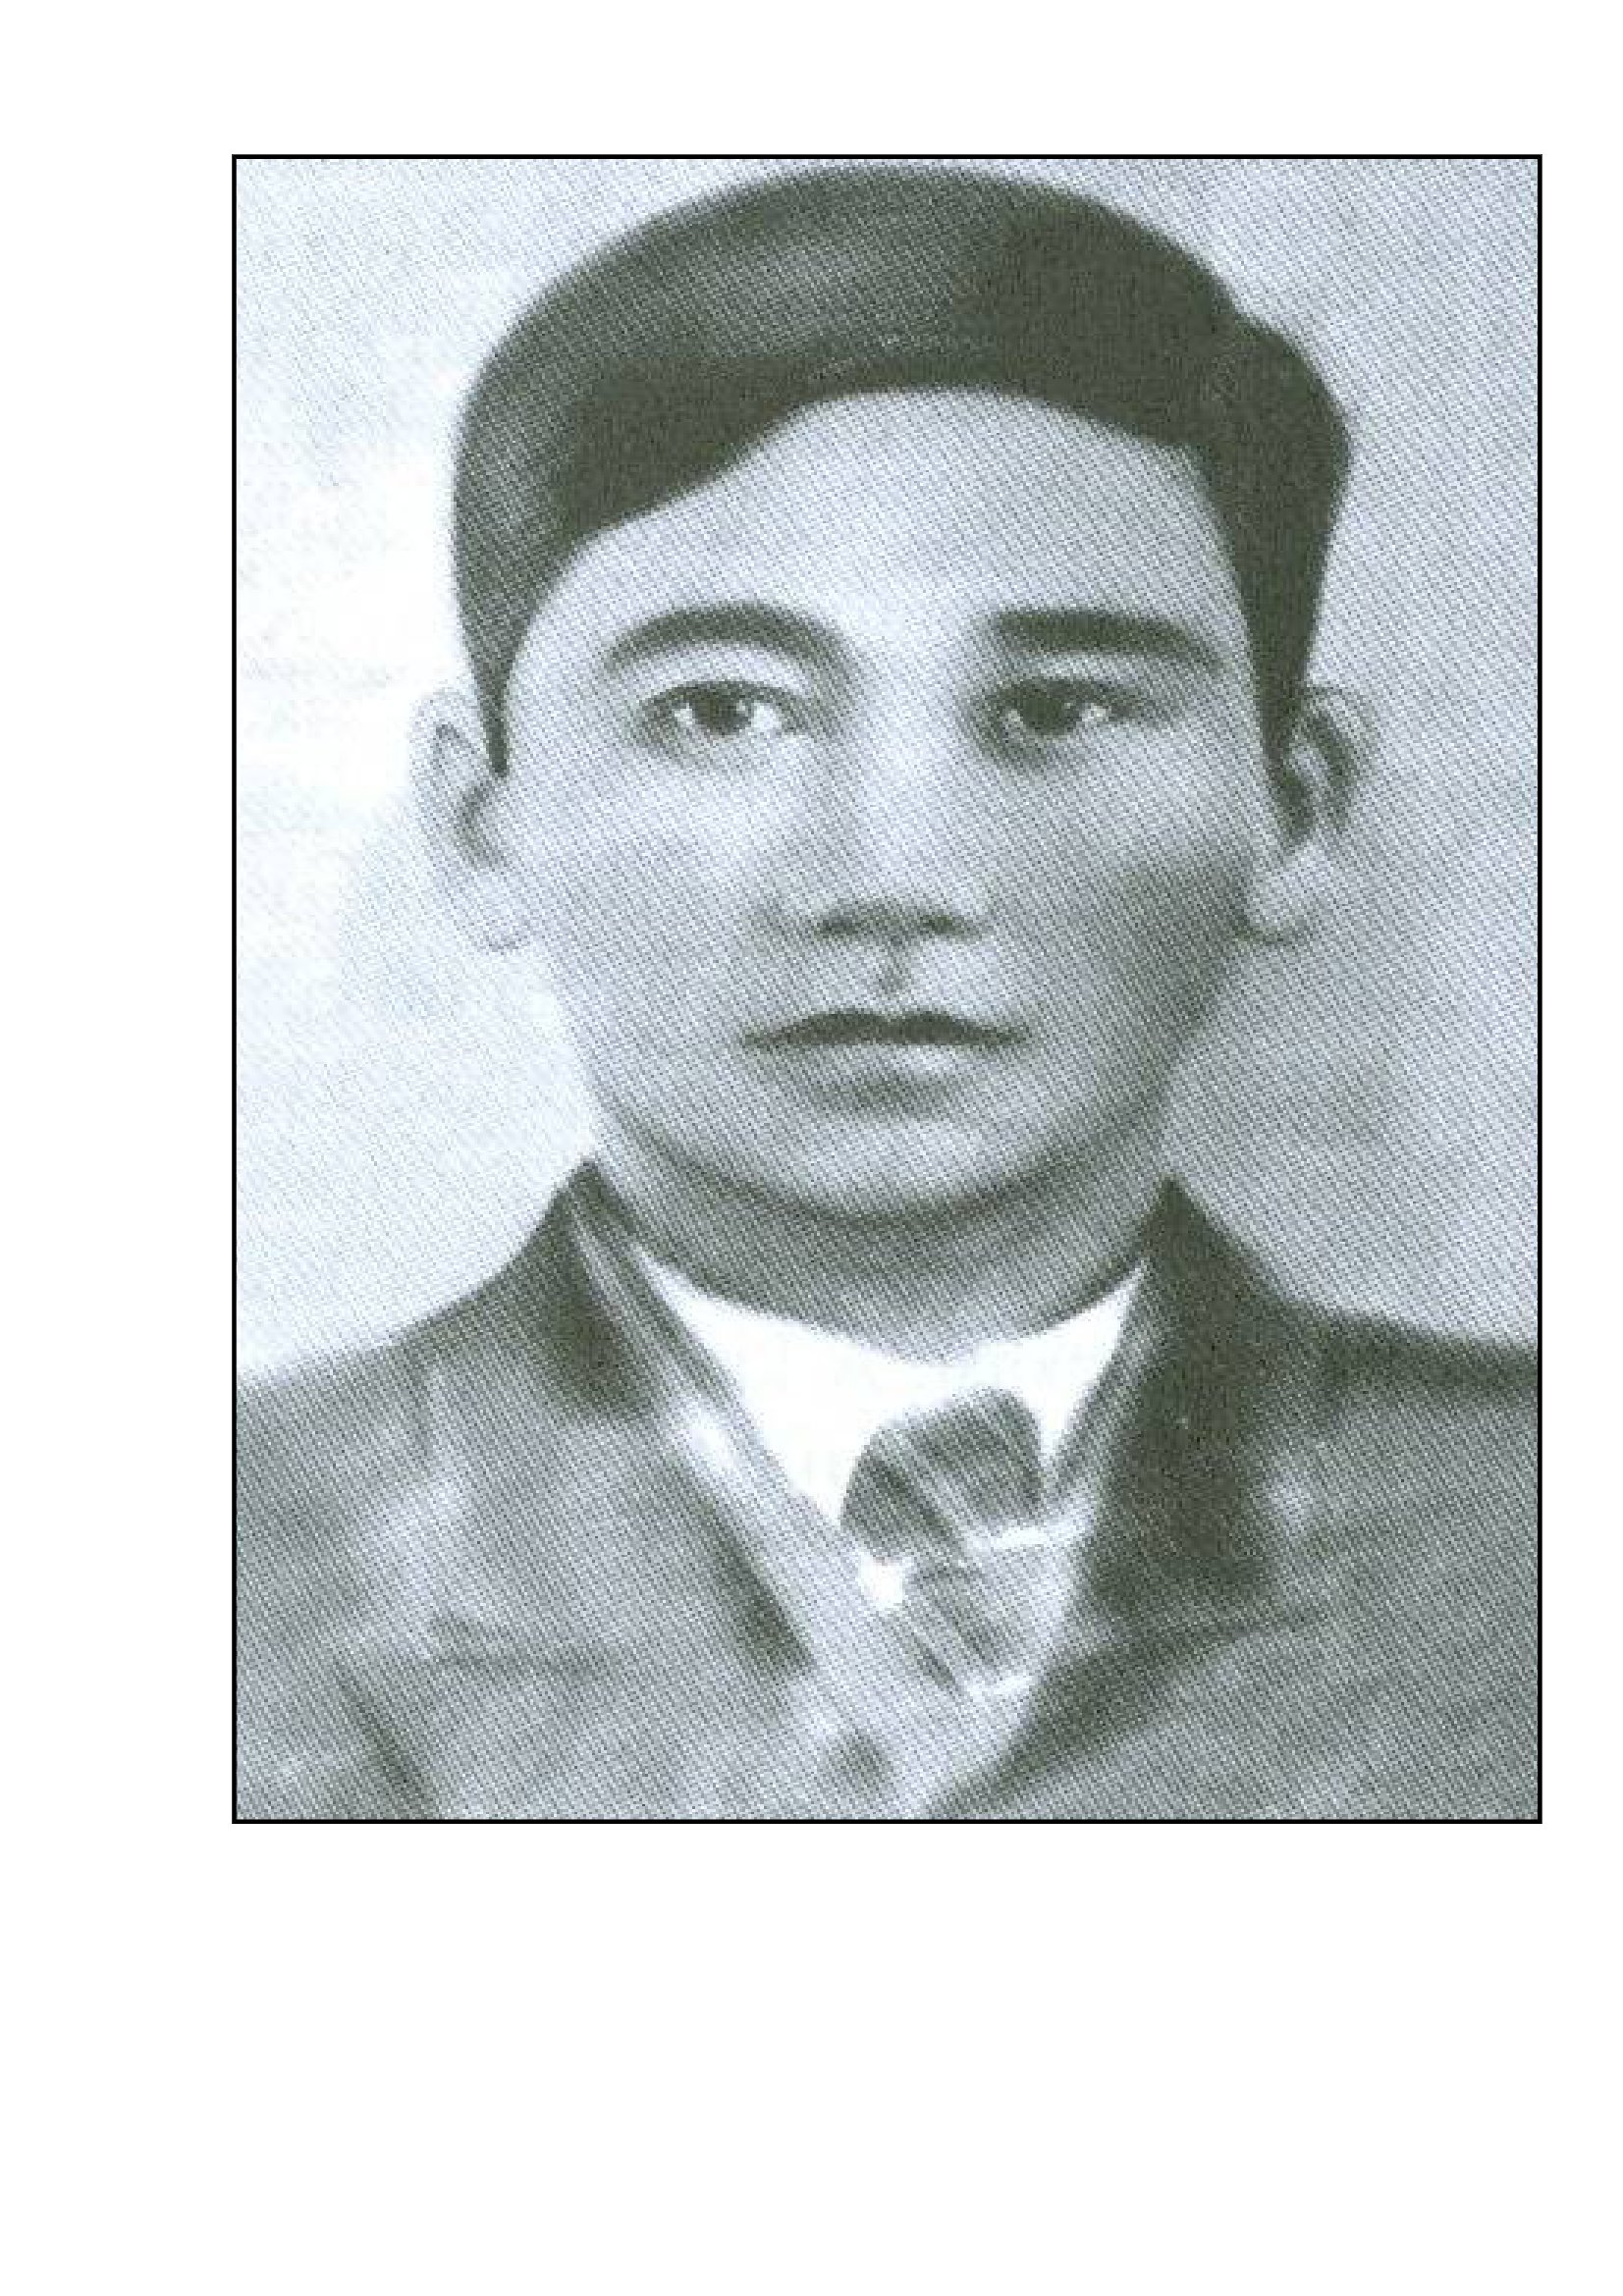 МАОУ «СОШ № 41 г. Улан-Удэ»